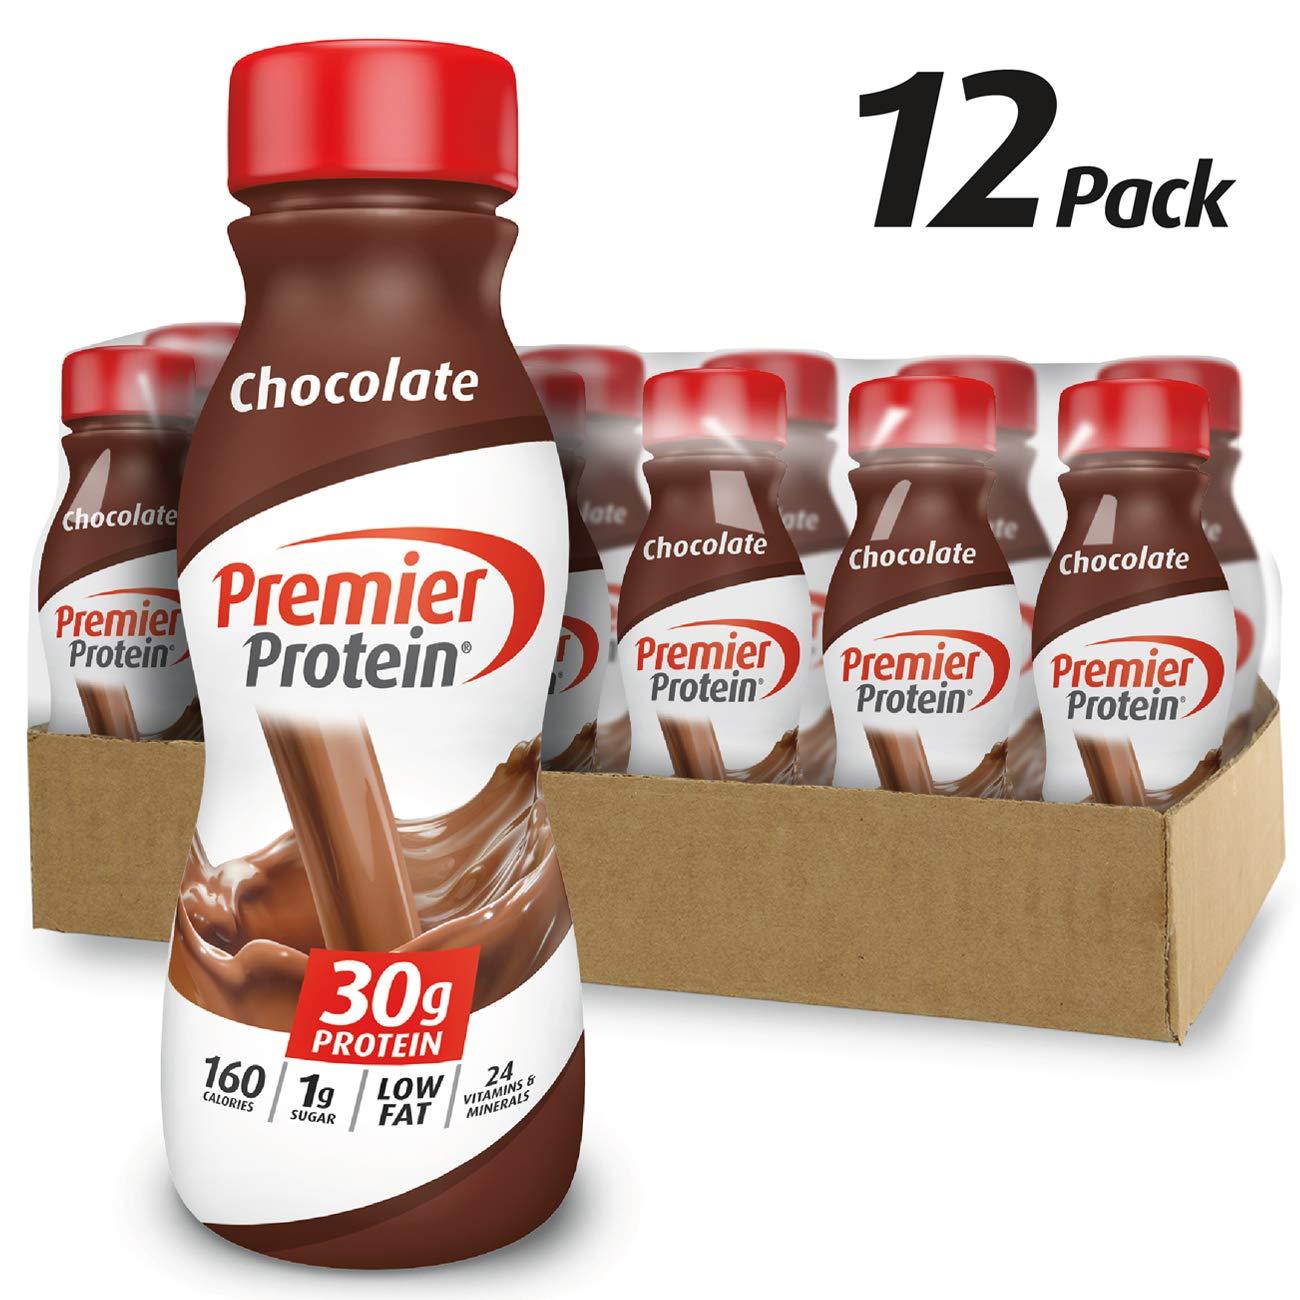 Premier Protein 30g Protein Shake, Chocolate, 11.5 Fl Oz, Pack of 12 by Premier Protein